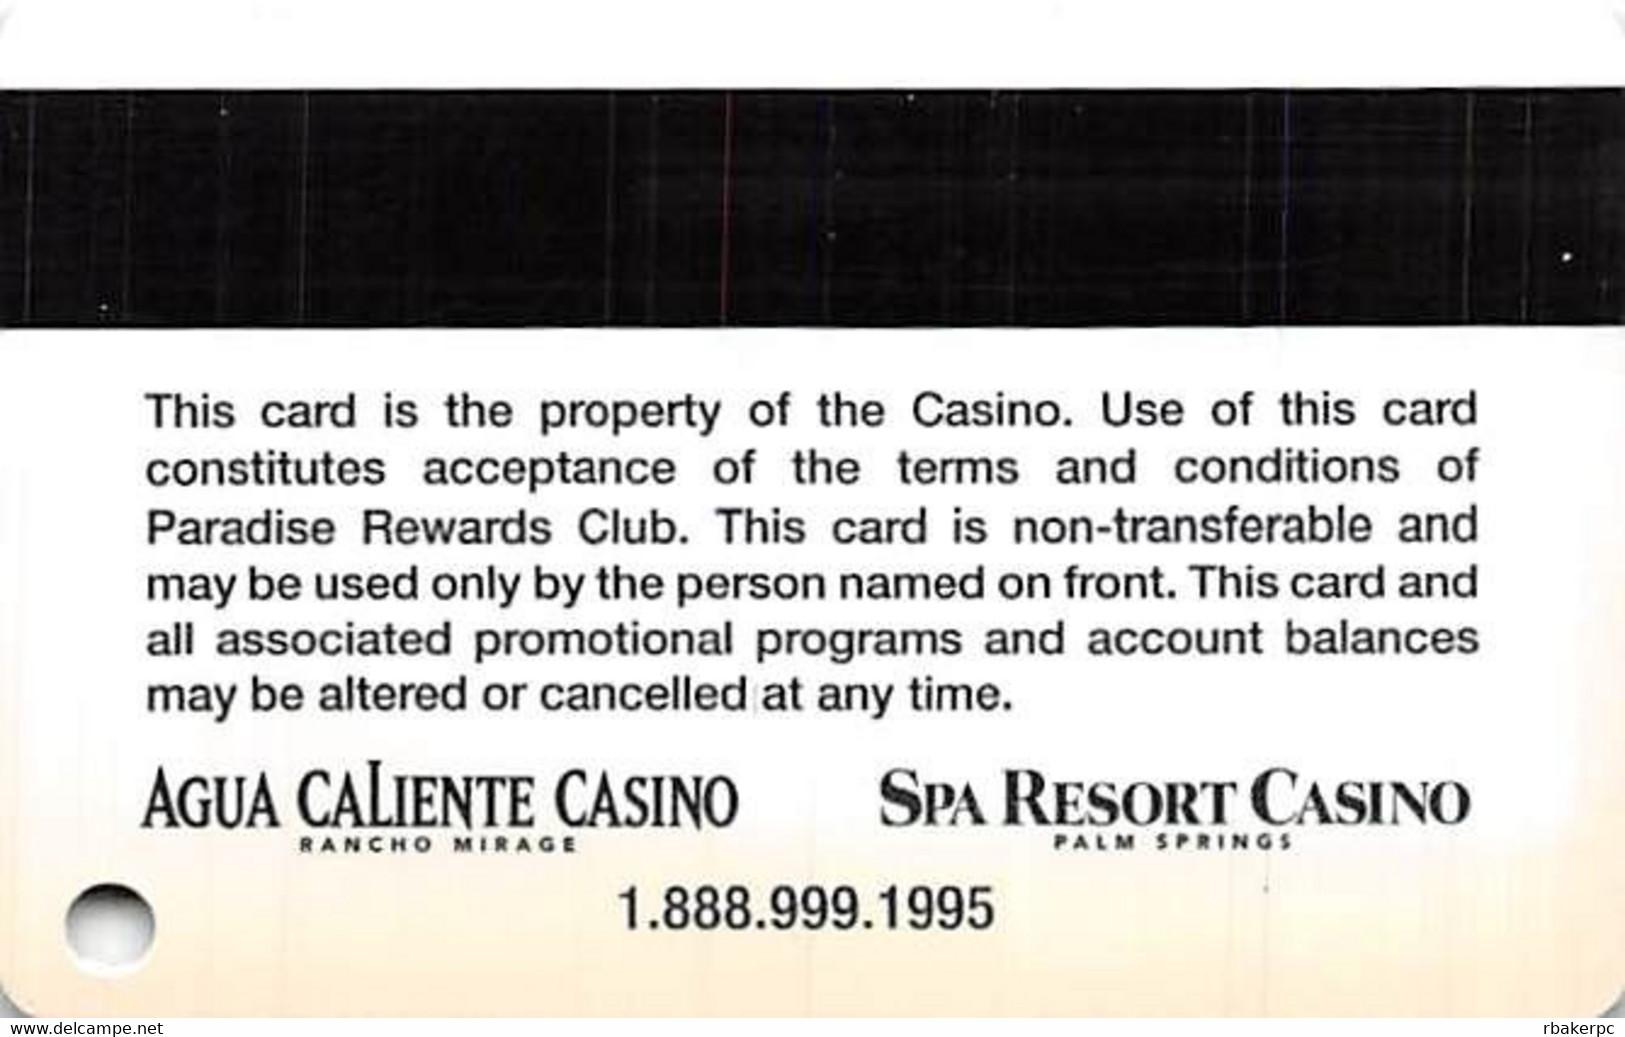 Agua Caliente & Spa Resort Casinos In California, USA - Slot Card - Casino Cards